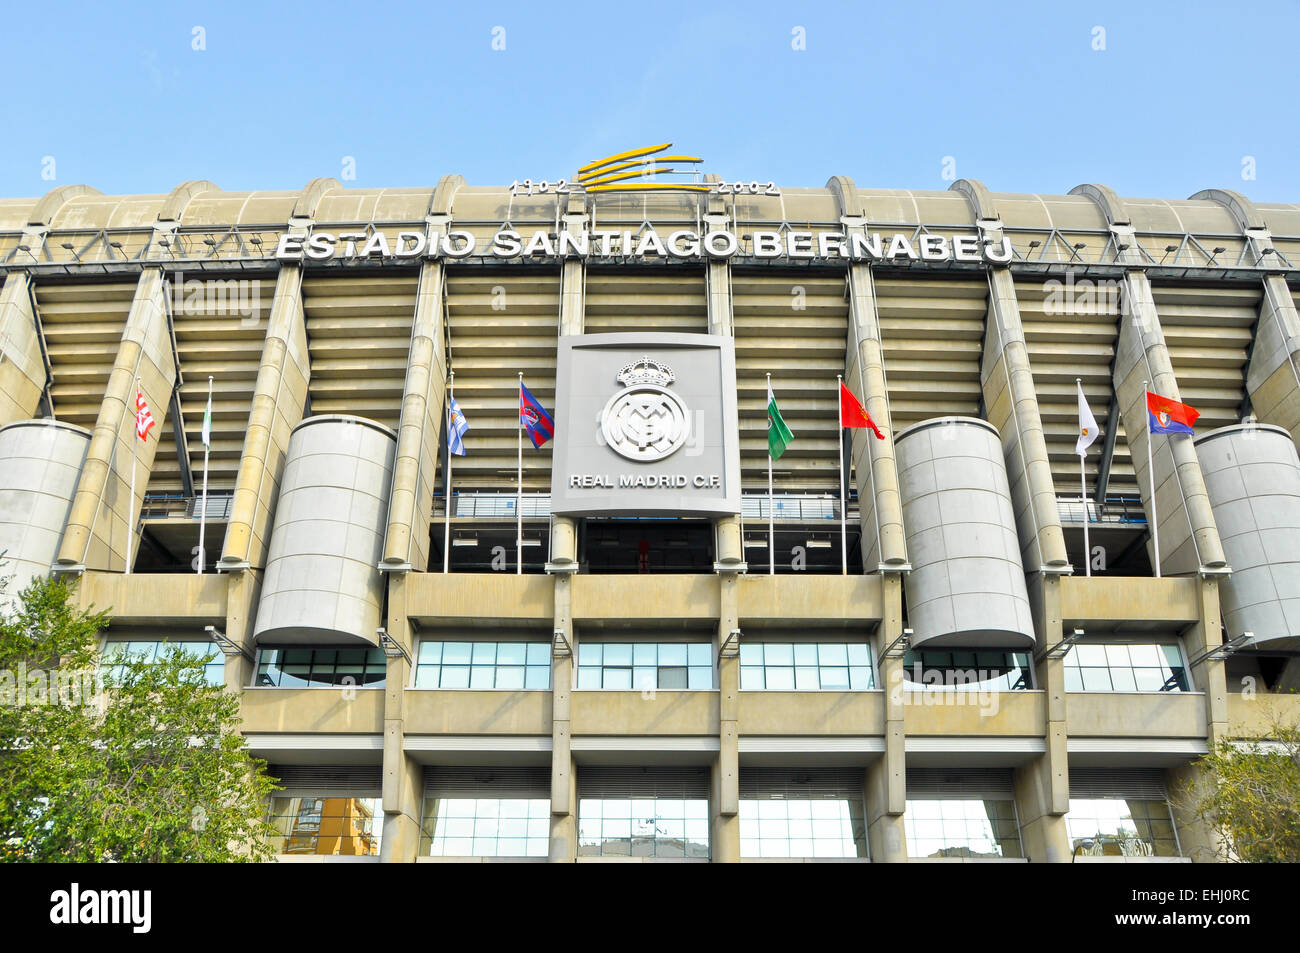 Real Madrid Stadium - Stock Image